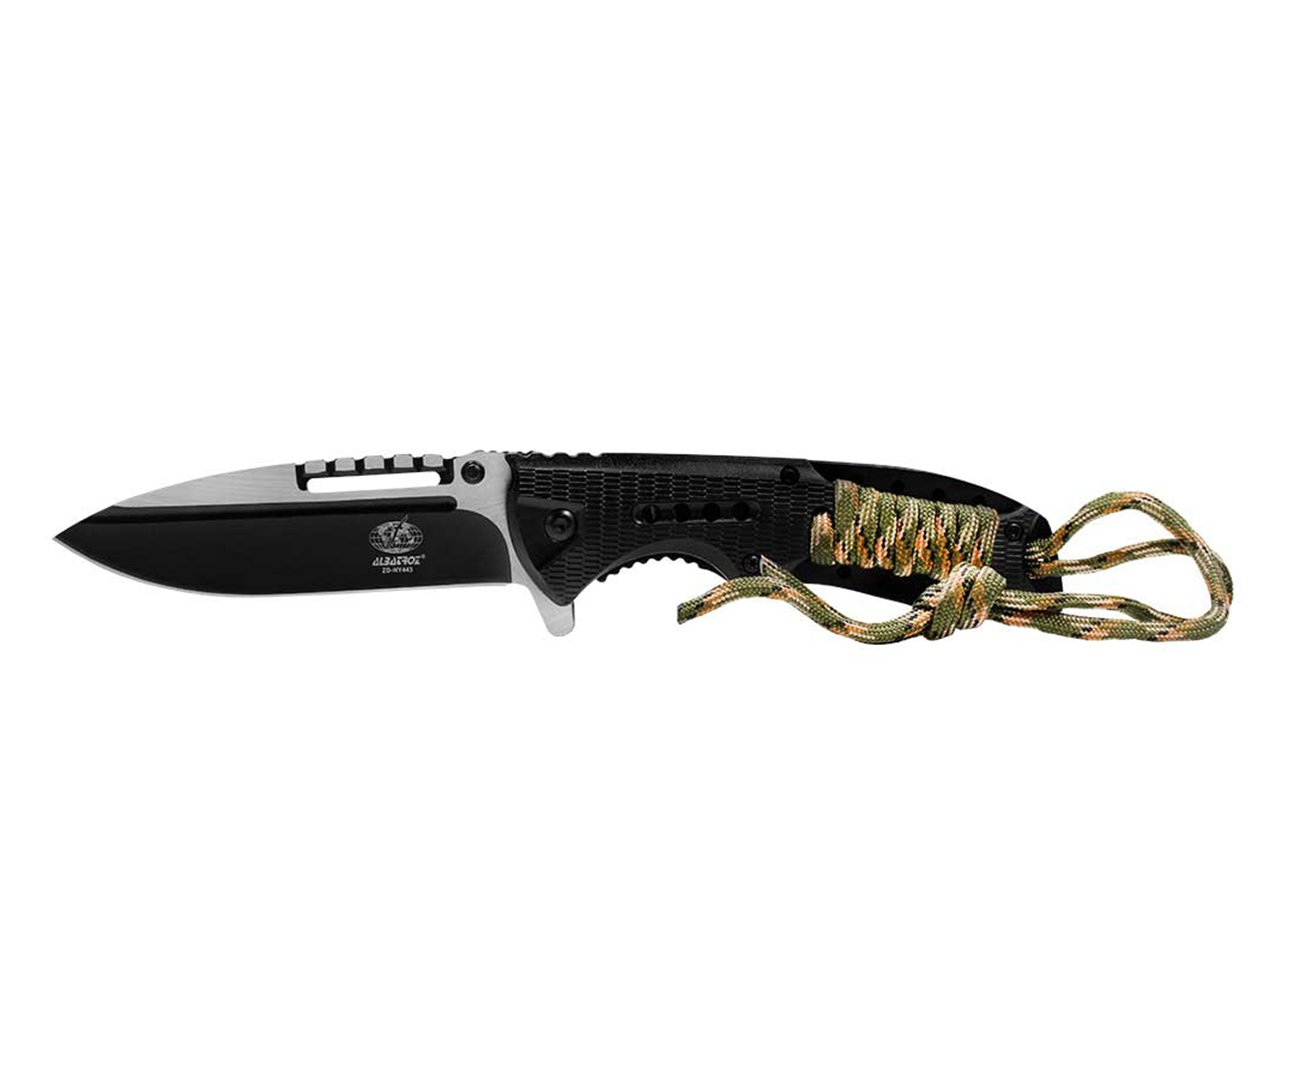 Canivete Zdhy443 - Albatroz